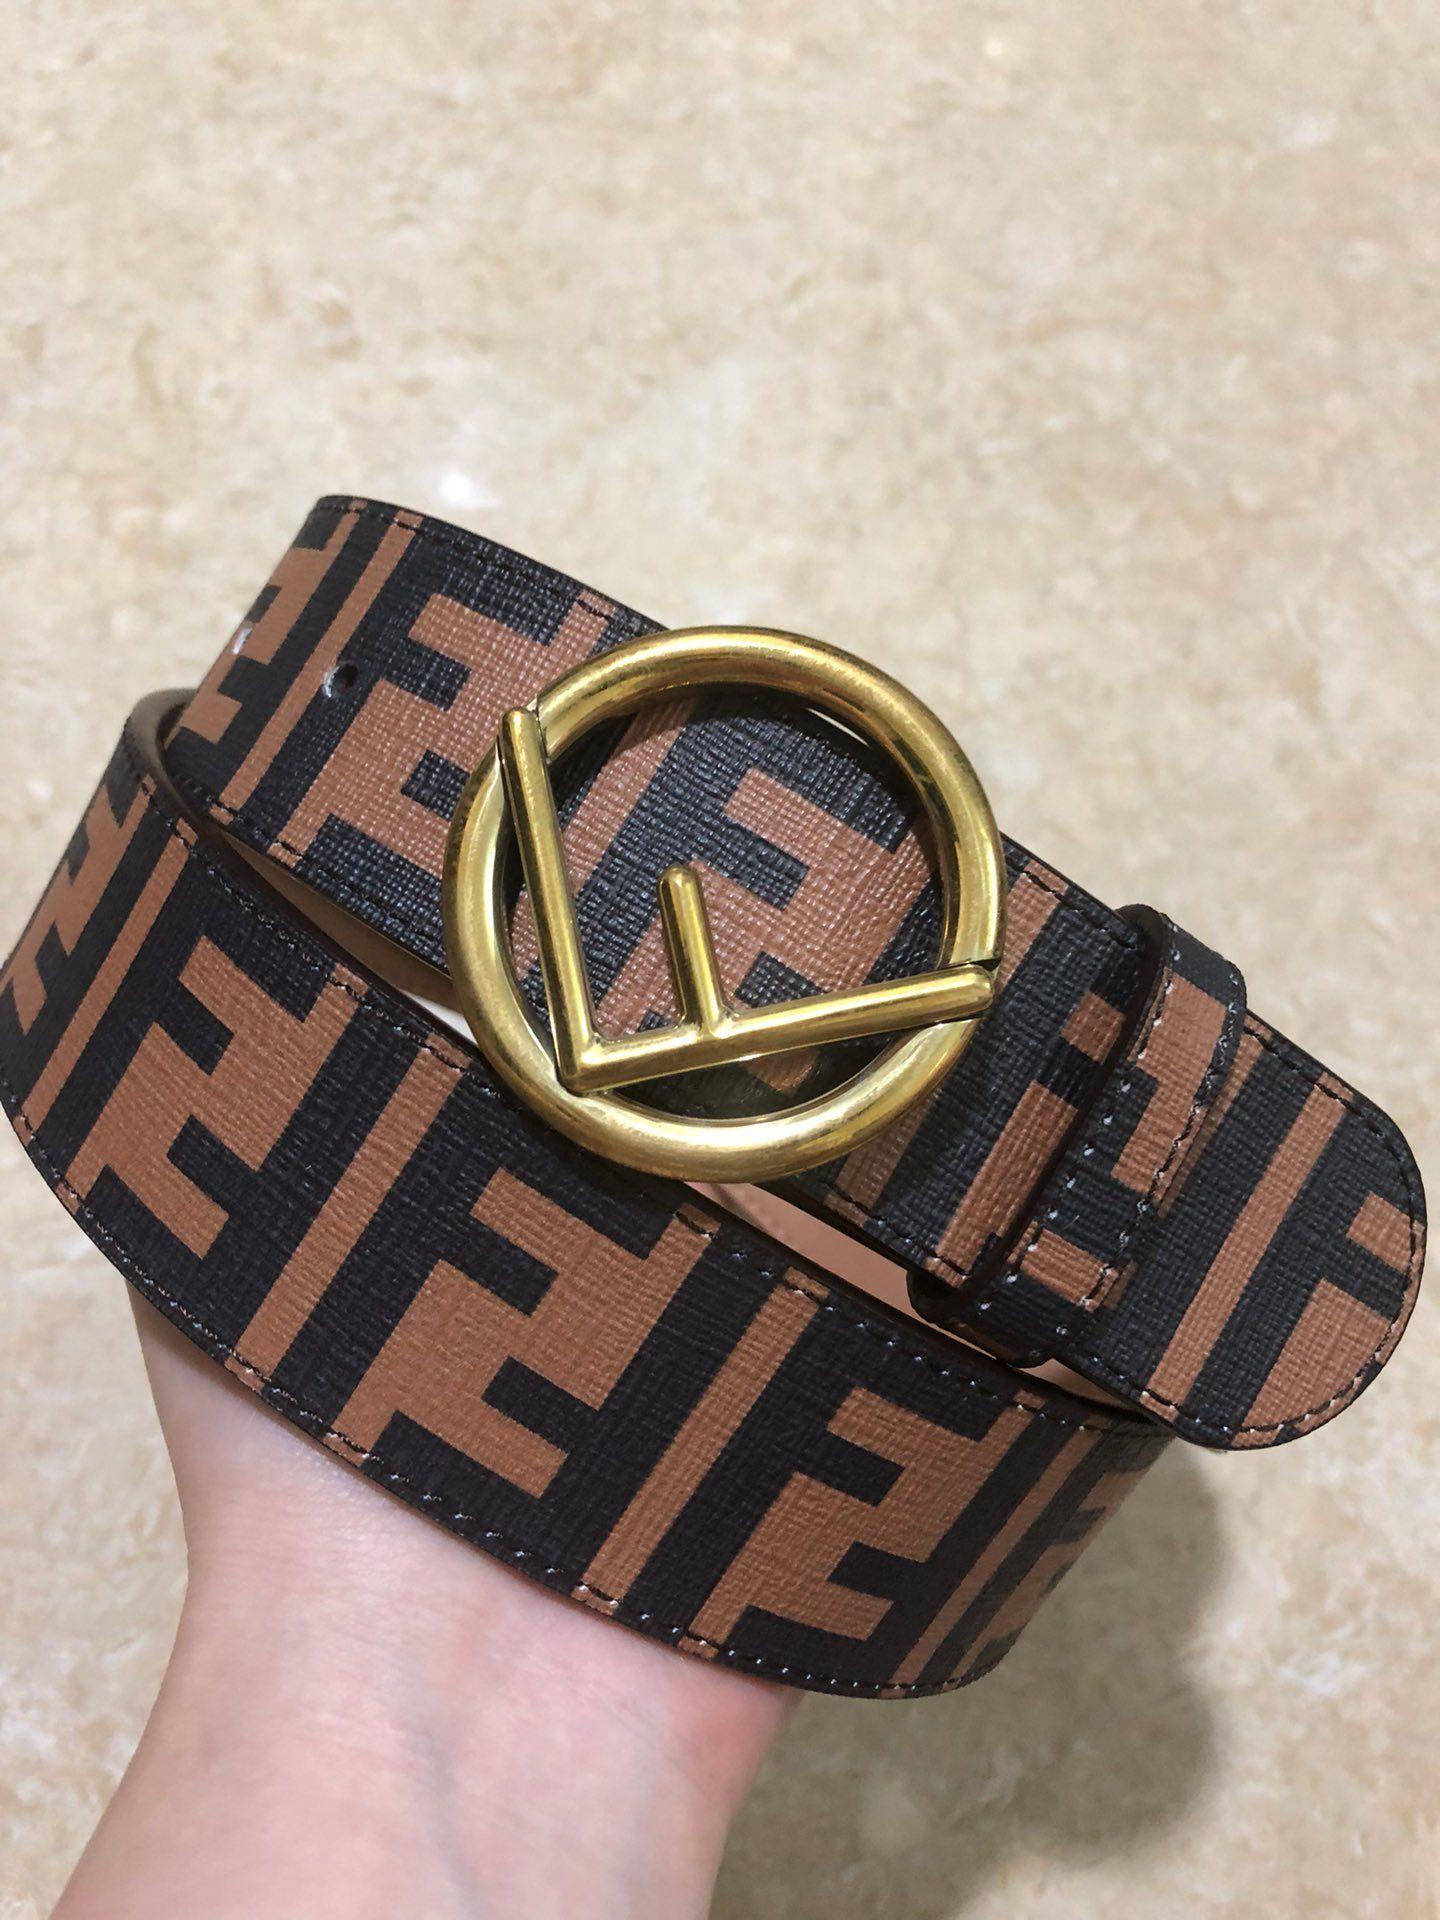 2018 Cheap Fendi FF logo leather beltbelt